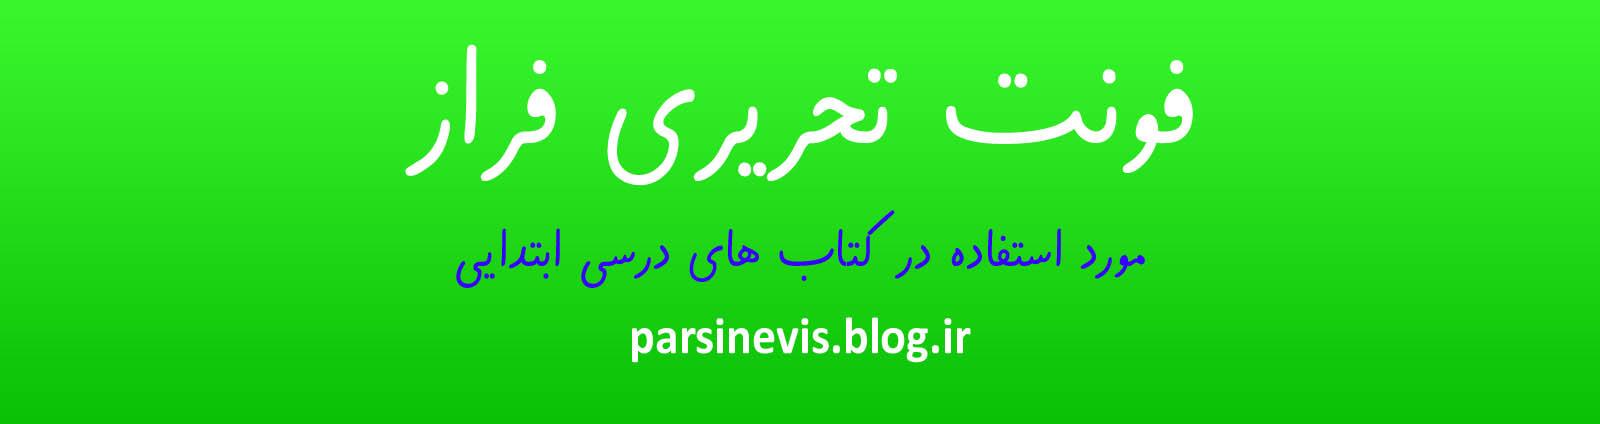 faraz-font